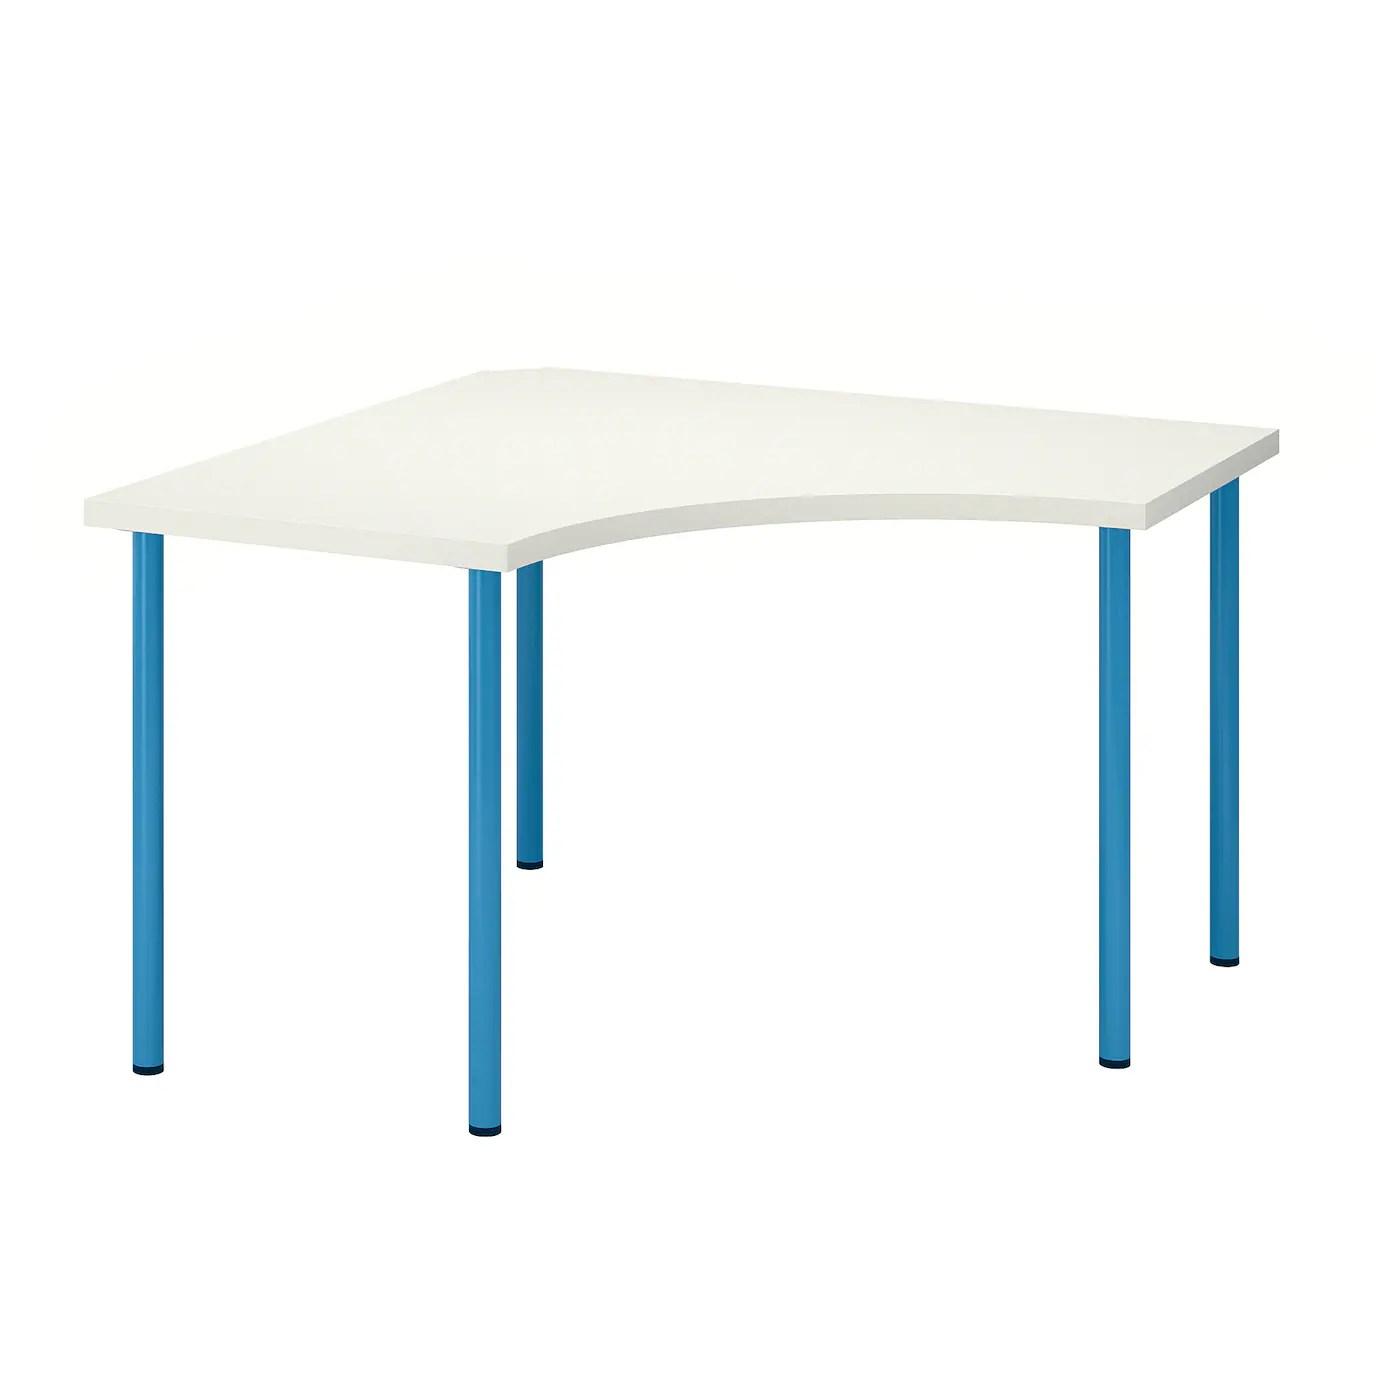 linnmon adils table d angle blanc bleu 120x120 cm